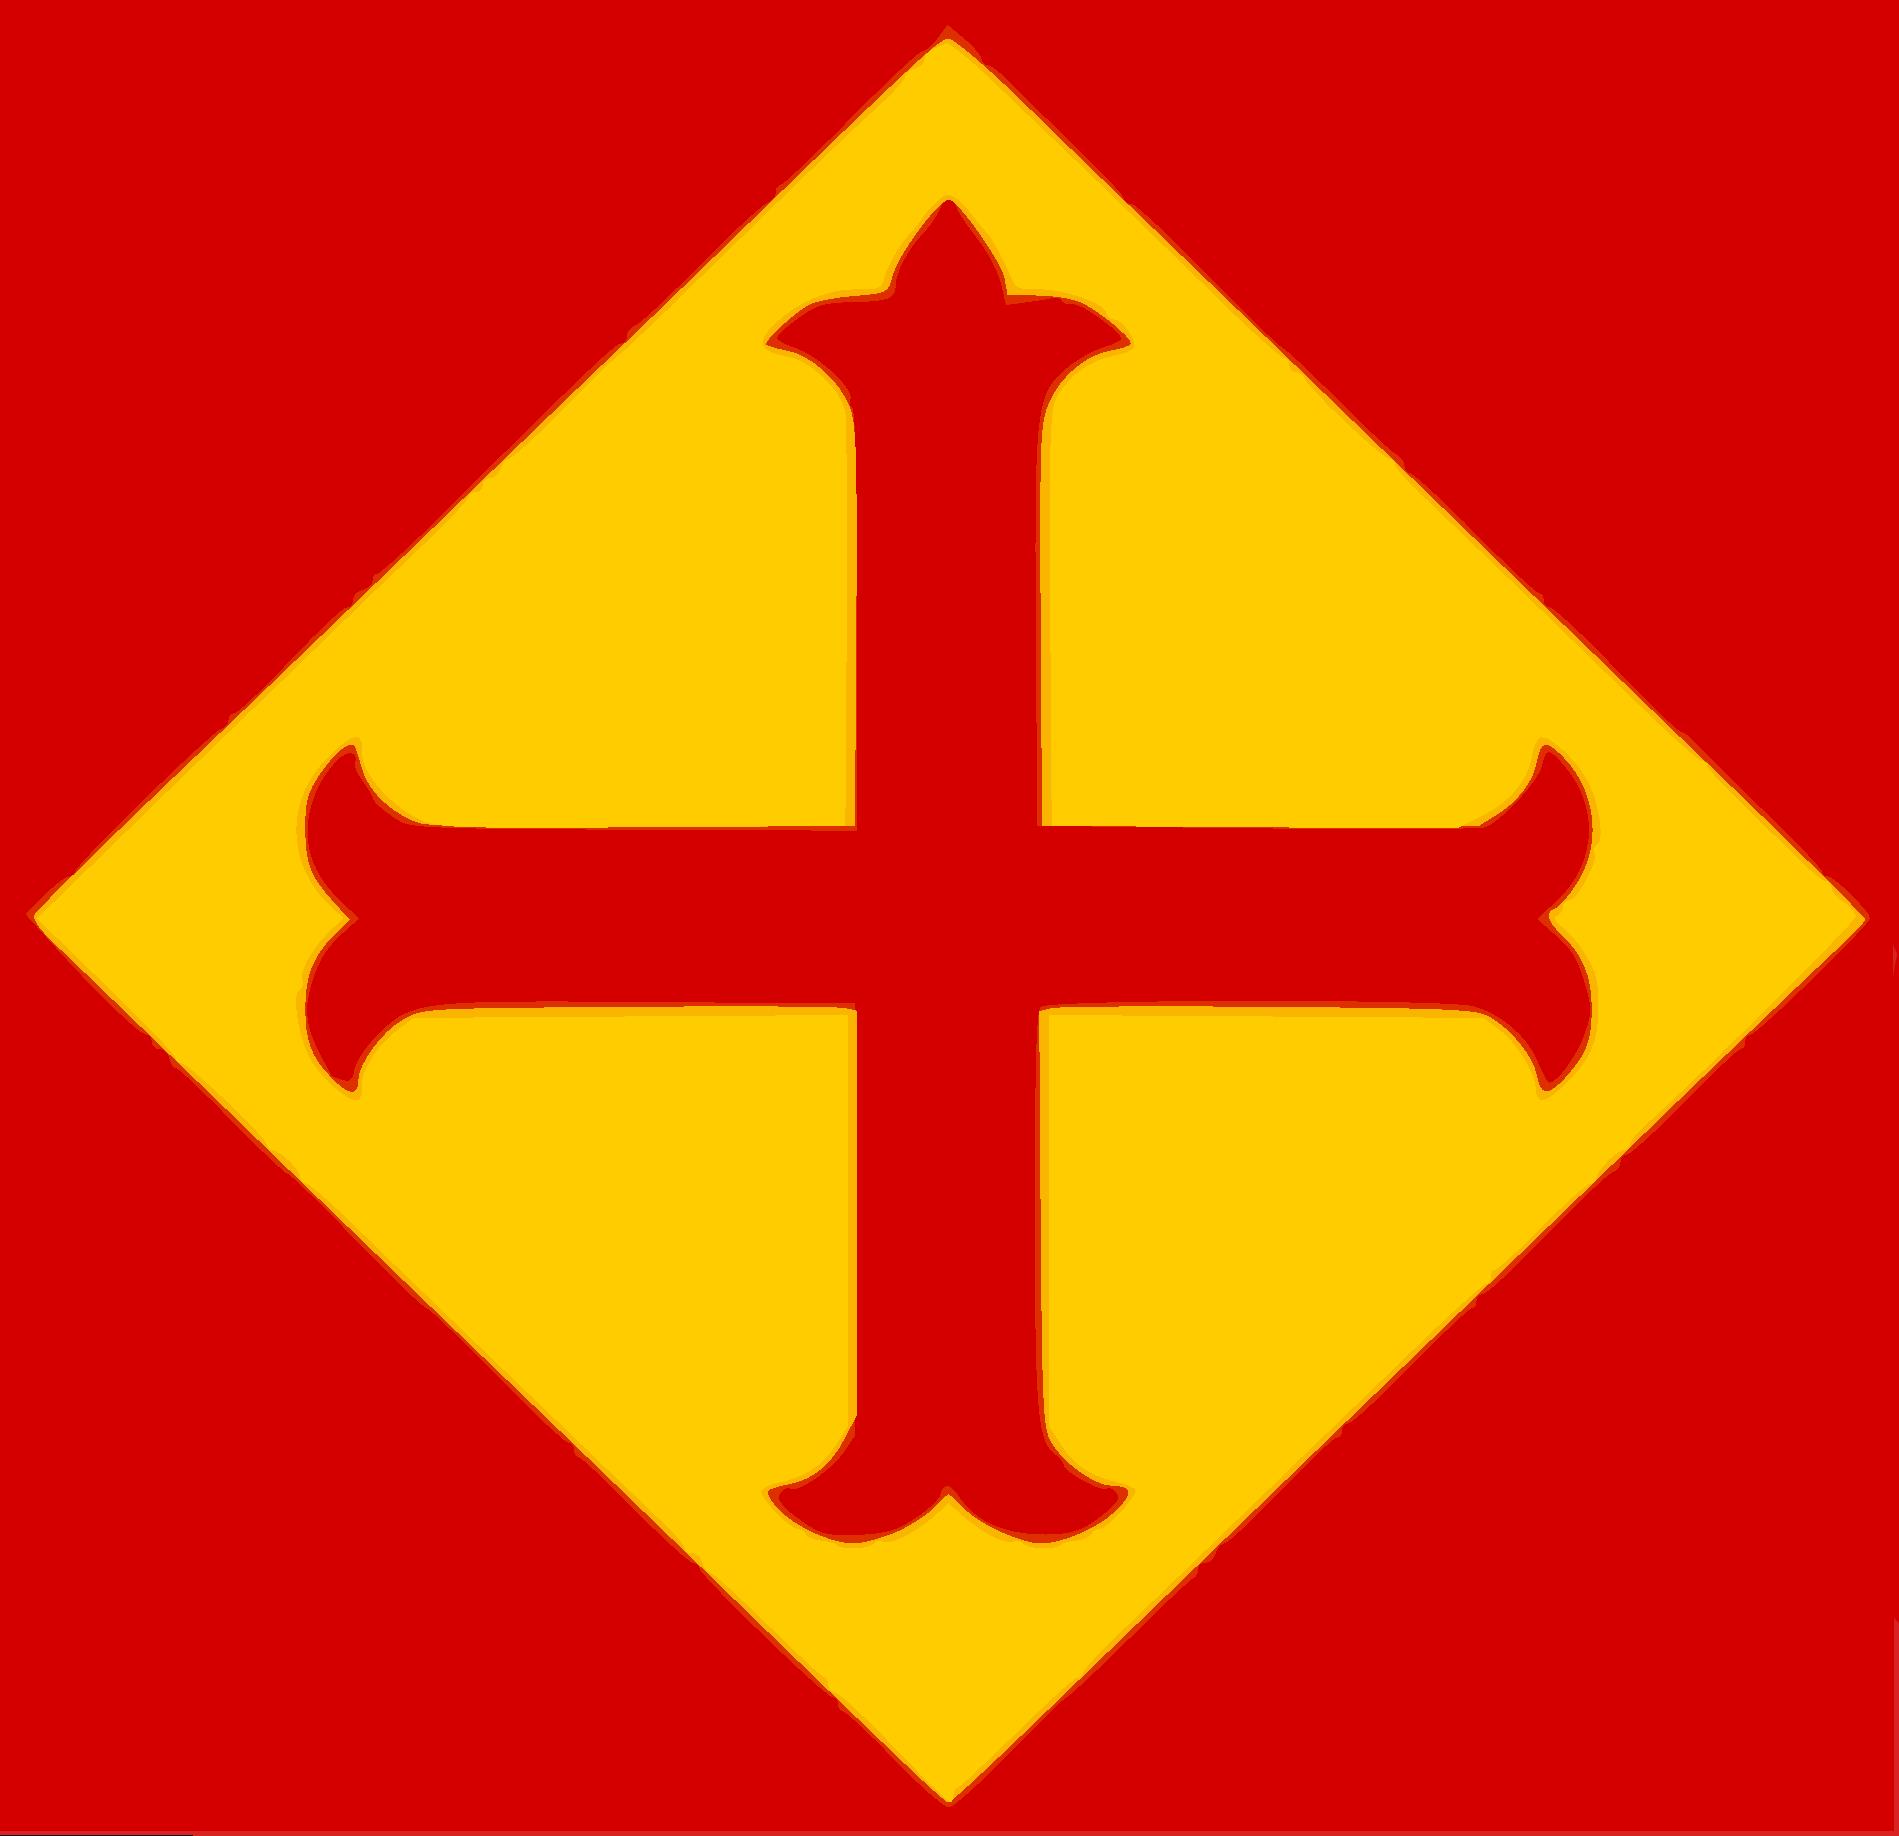 File:CEDA political logo png - Wikipedia